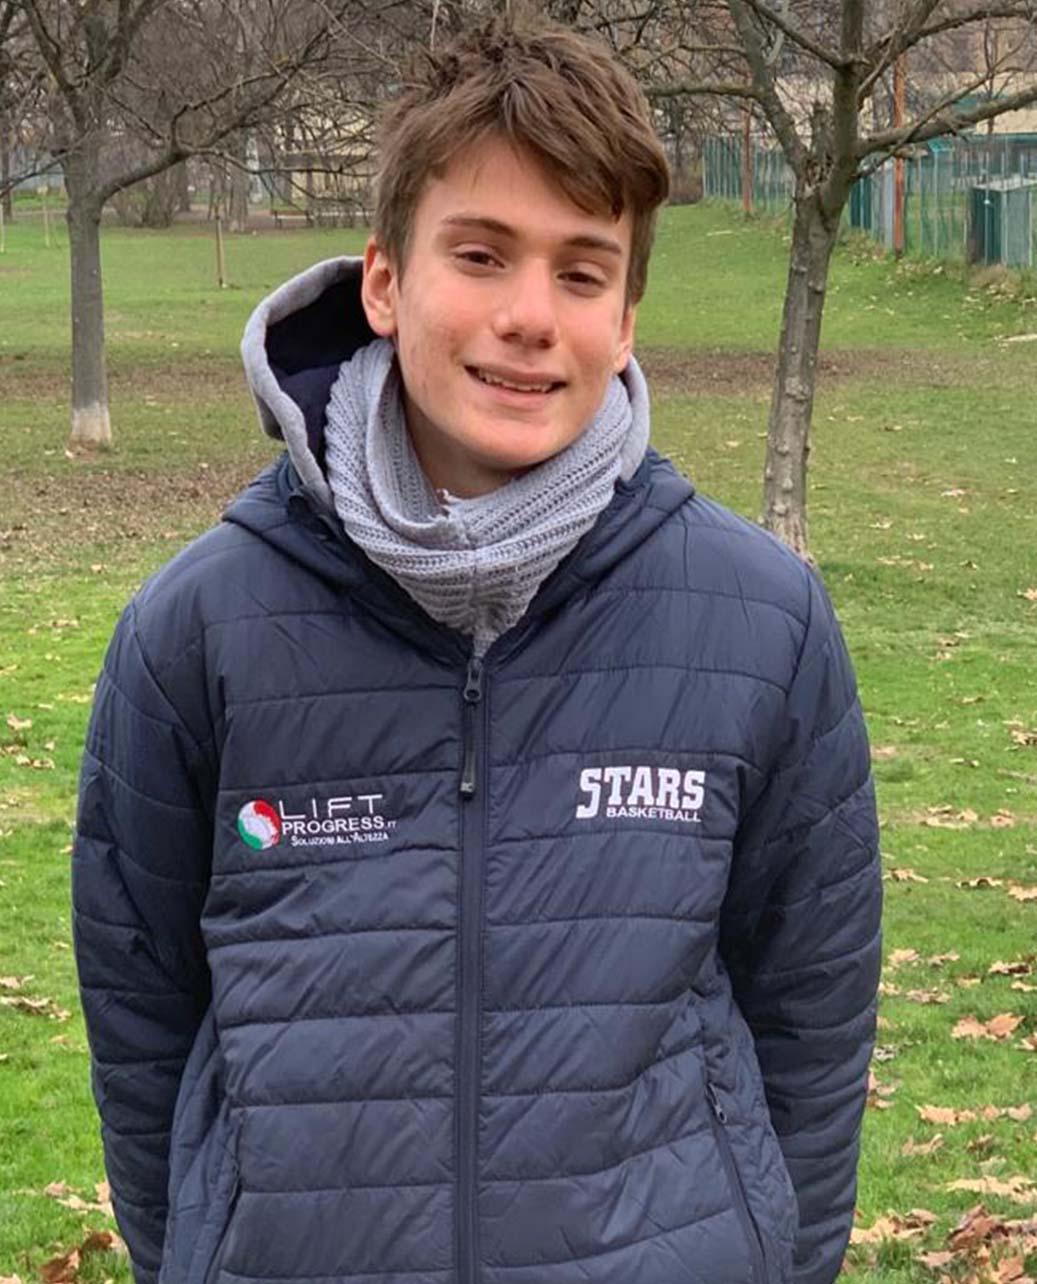 Collina Pietro - Under 15